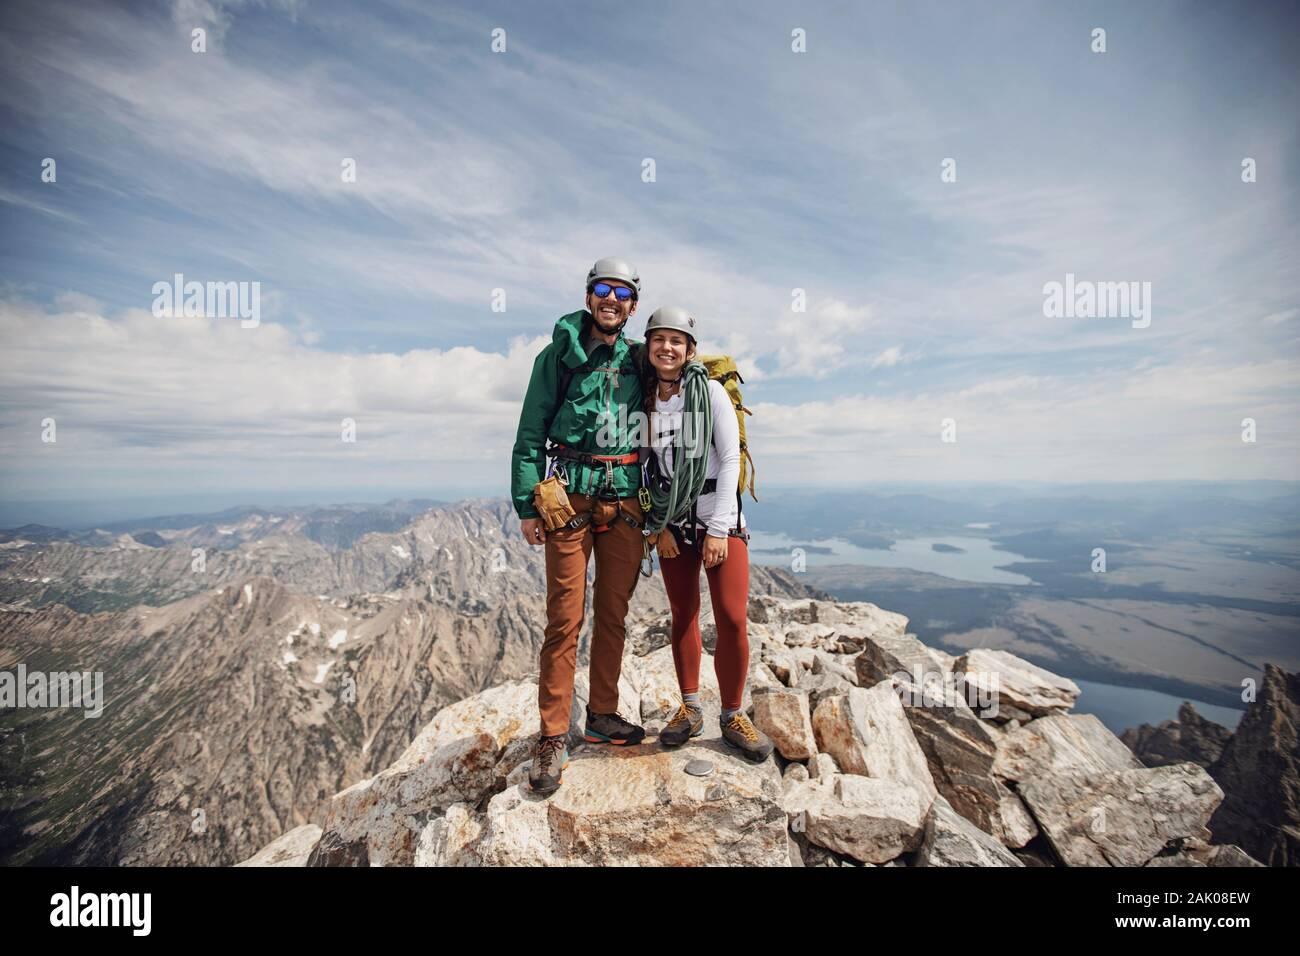 Uomini e donne climber sorridono dopo aver sommite il Grand Teton, Wyoming Foto Stock